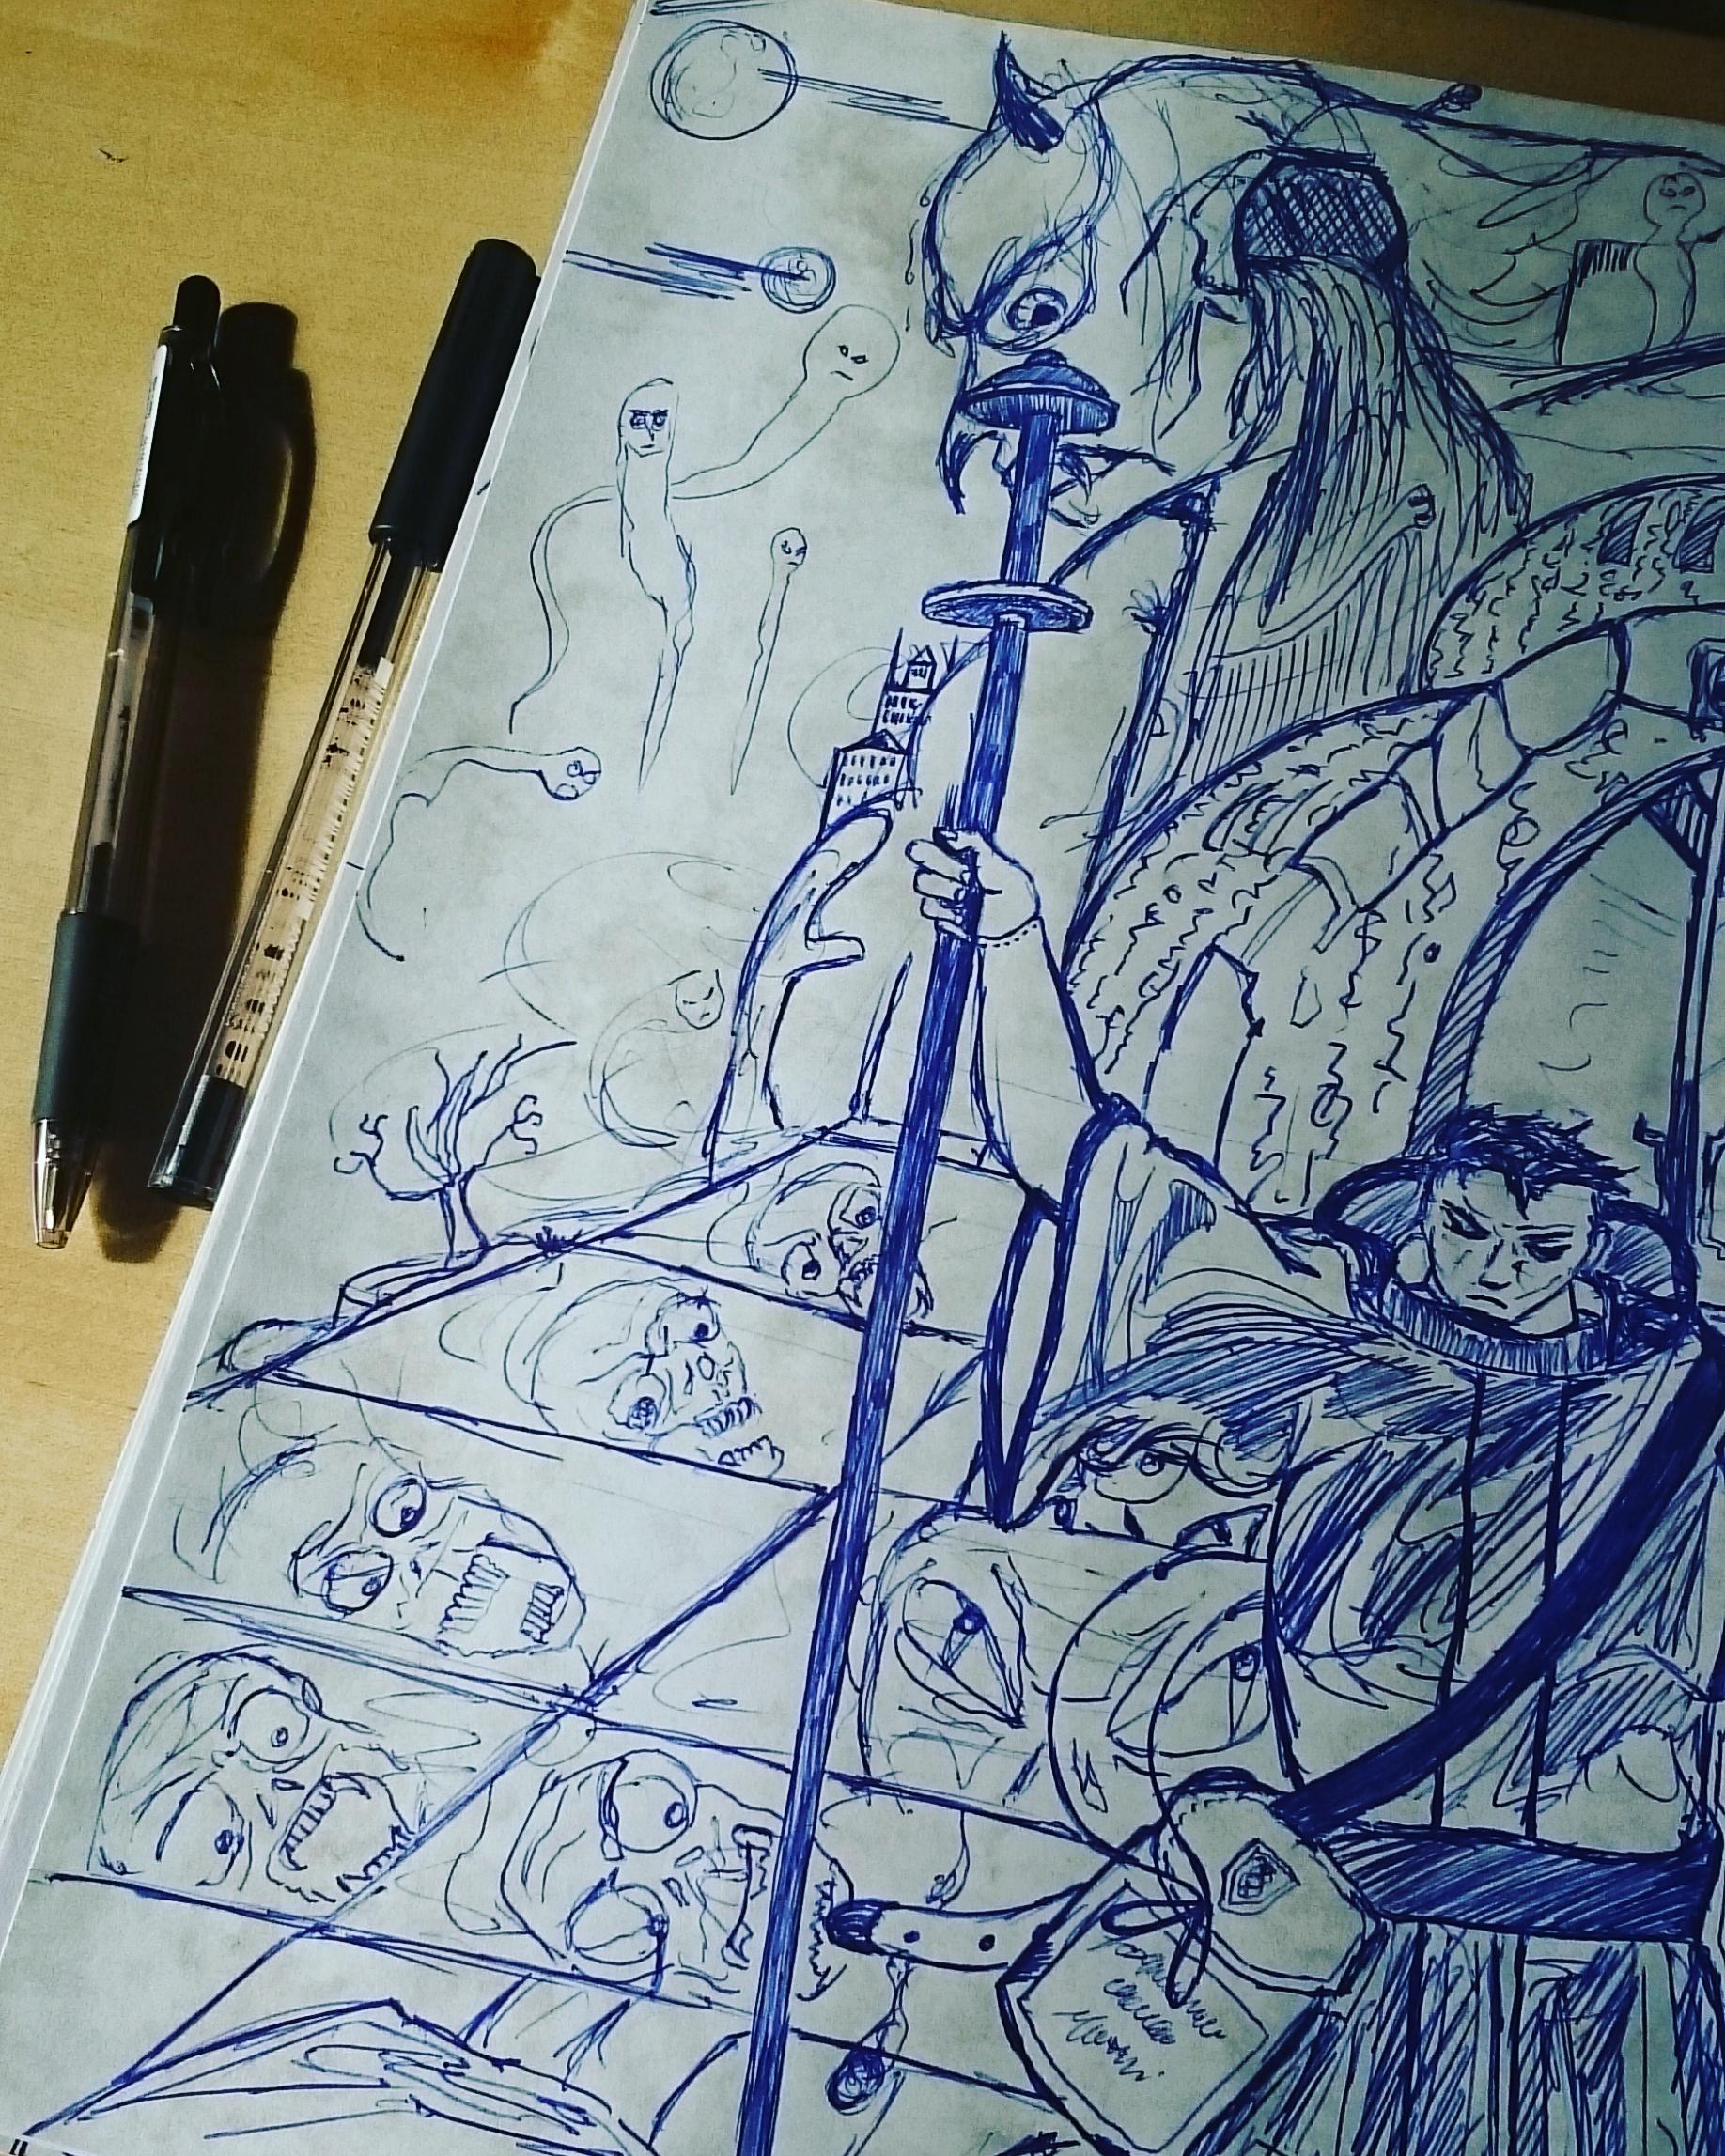 The Skriptor and the Demons Underworld